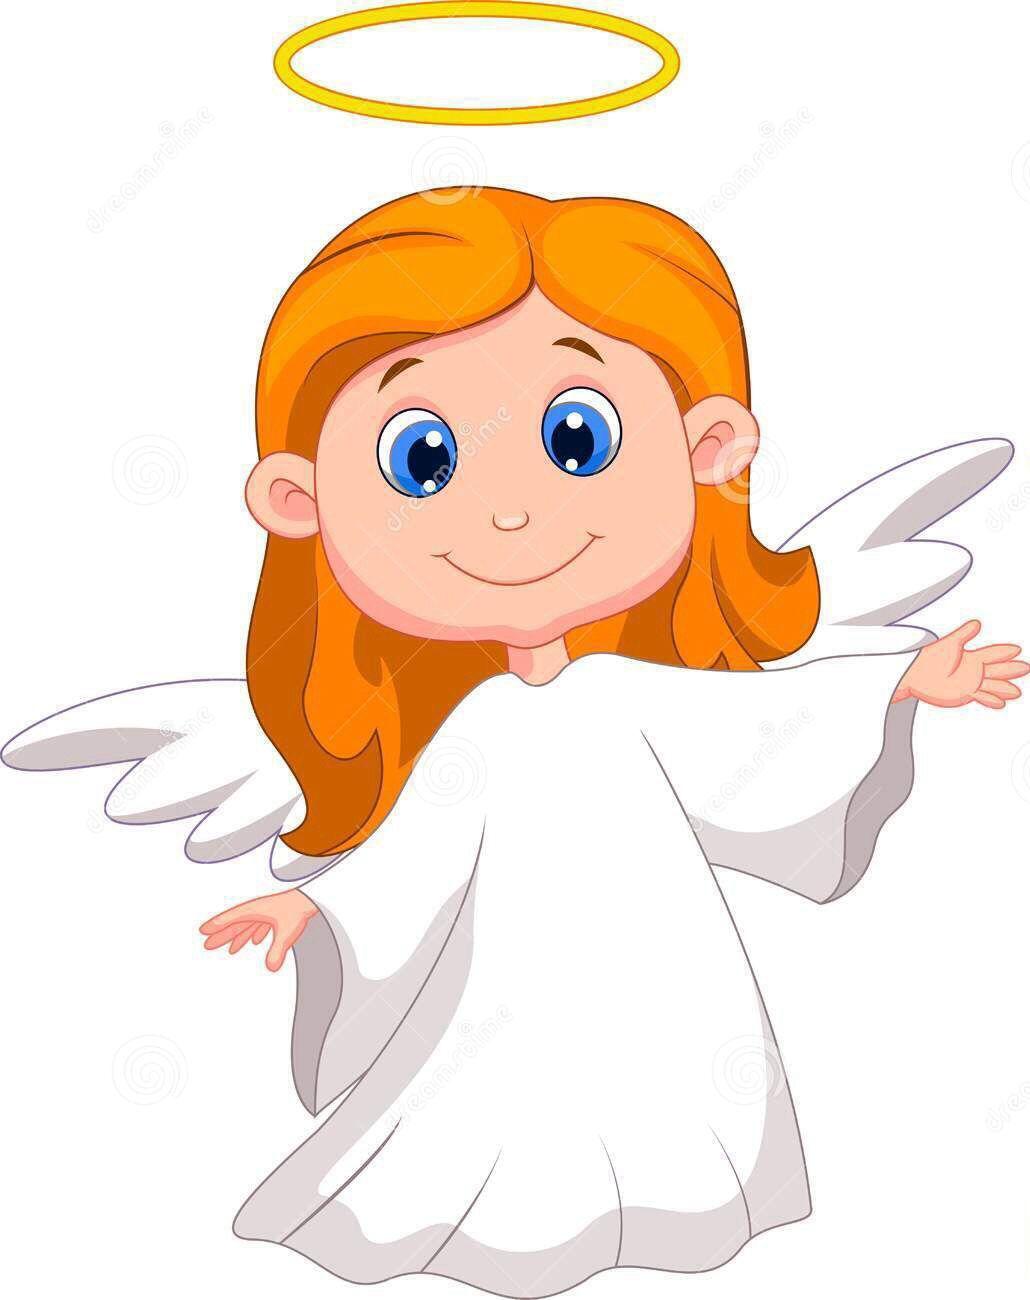 Bing clipart free cartoon angel jpg library Pin by ANA sanchez on Angels | Angel cartoon, Angel, Angel art jpg library